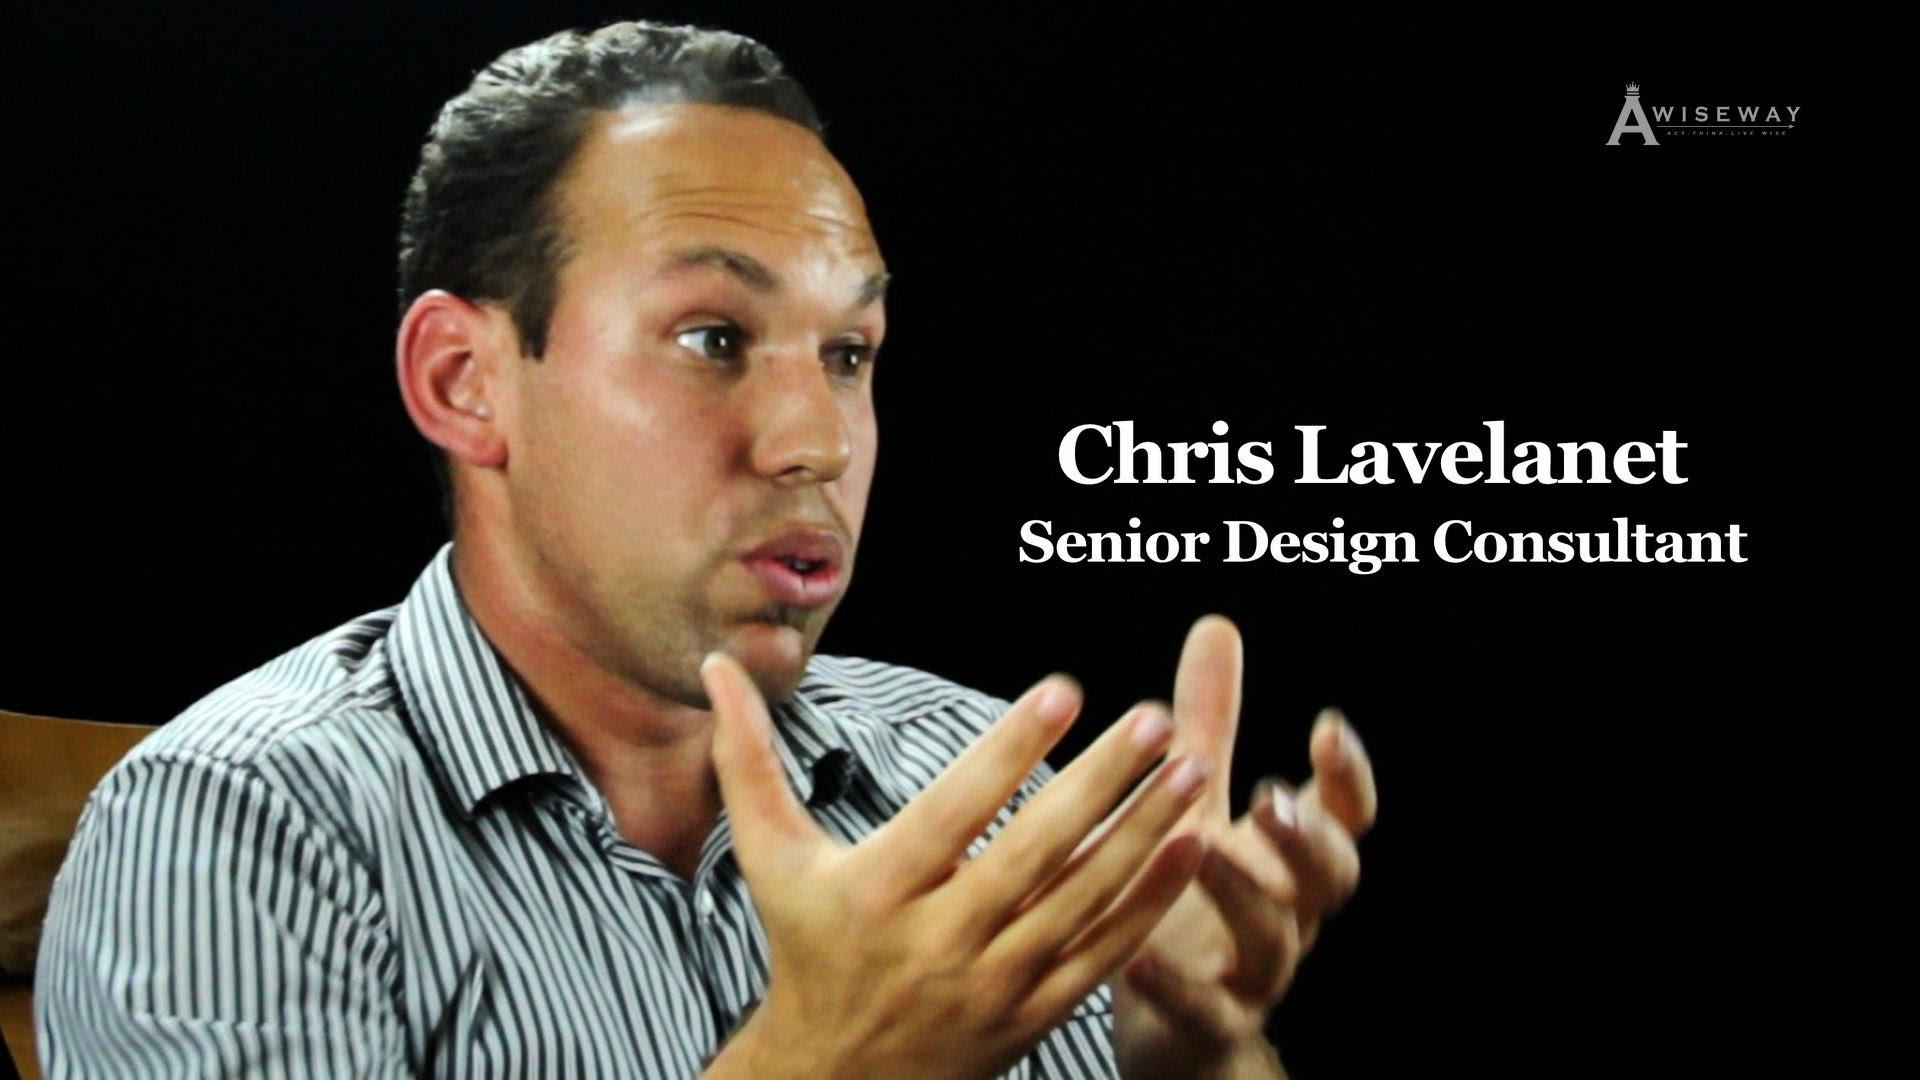 Advice on Accepting Design Criticism